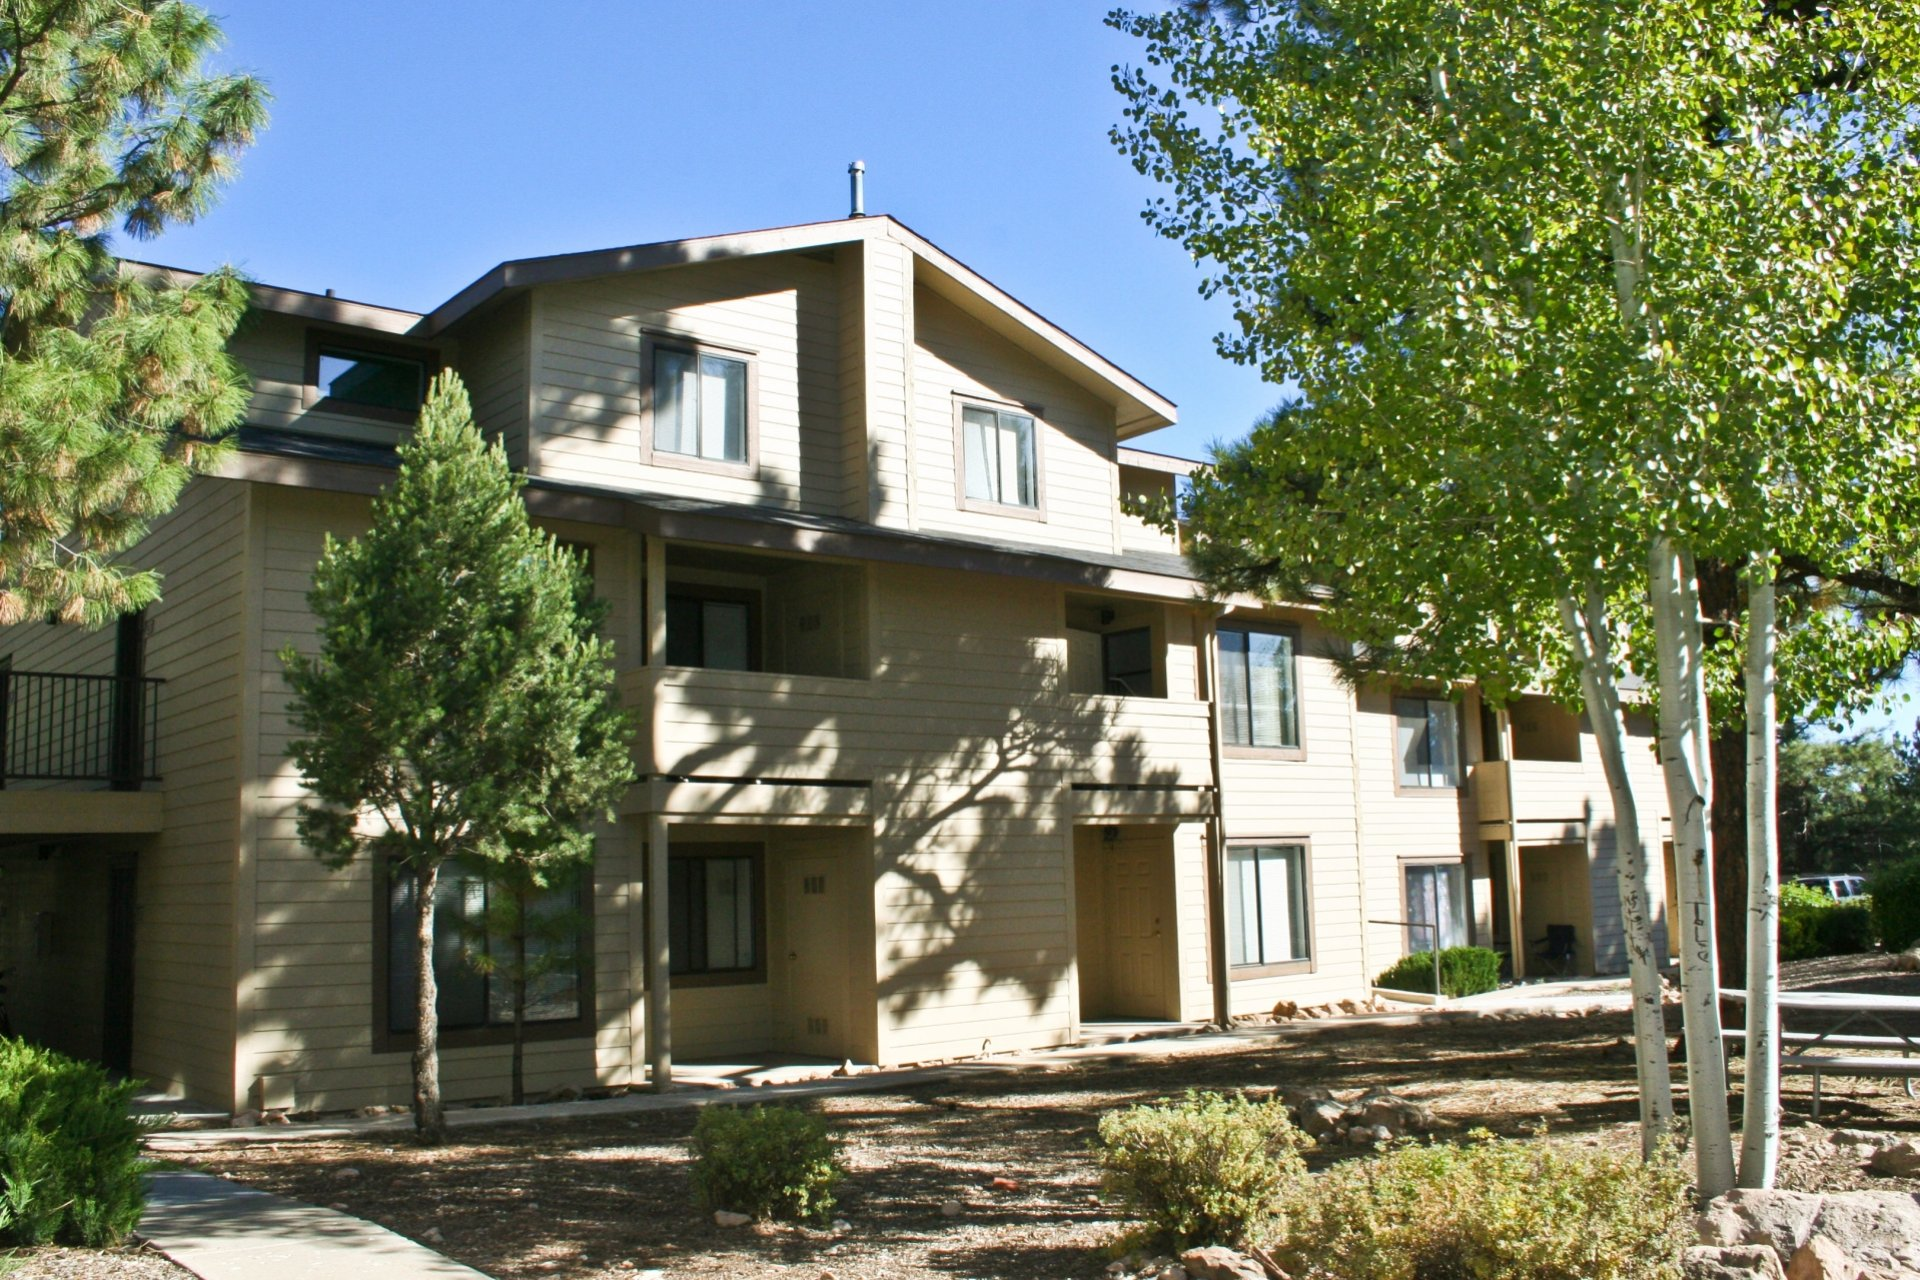 University West Apartments Flagstaff, AZ exterior and landscaping